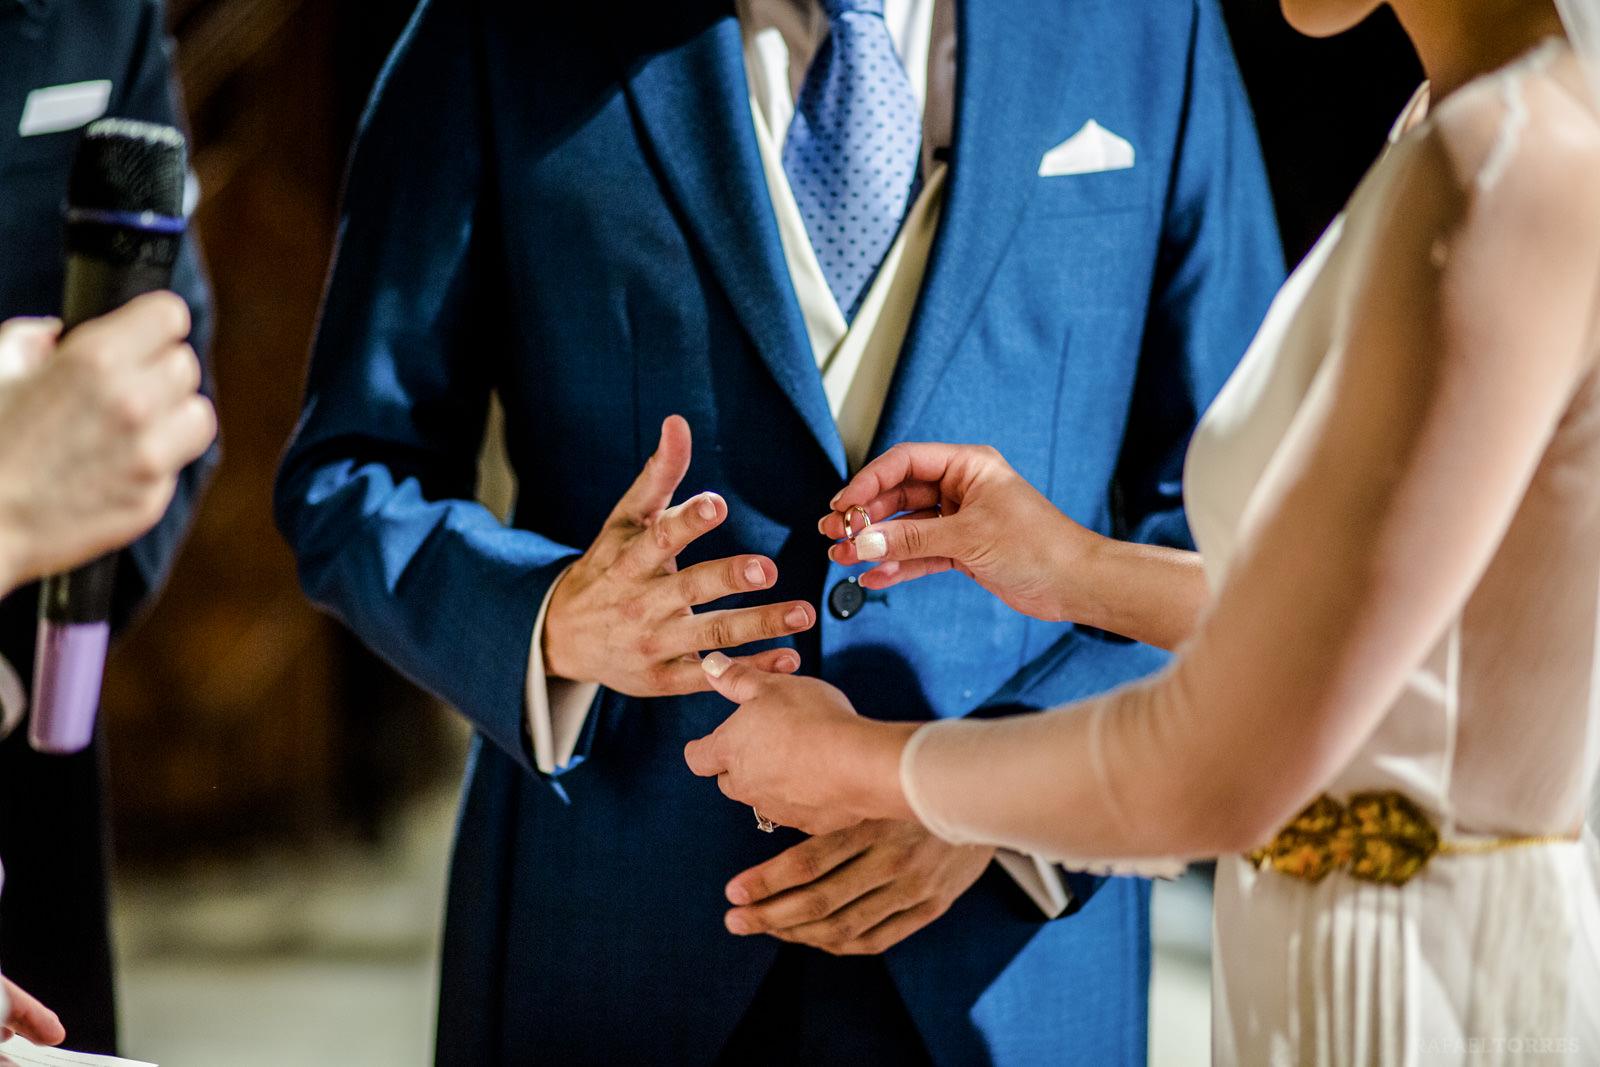 Rafael+Torres+fotografo+bodas+sevilla+madrid+barcelona+wedding+photographer+bodas+diferentes+bodaensevilla+molinillos+fotografo+hacienda+oran+alfonso+wedding+photographer-28.jpg